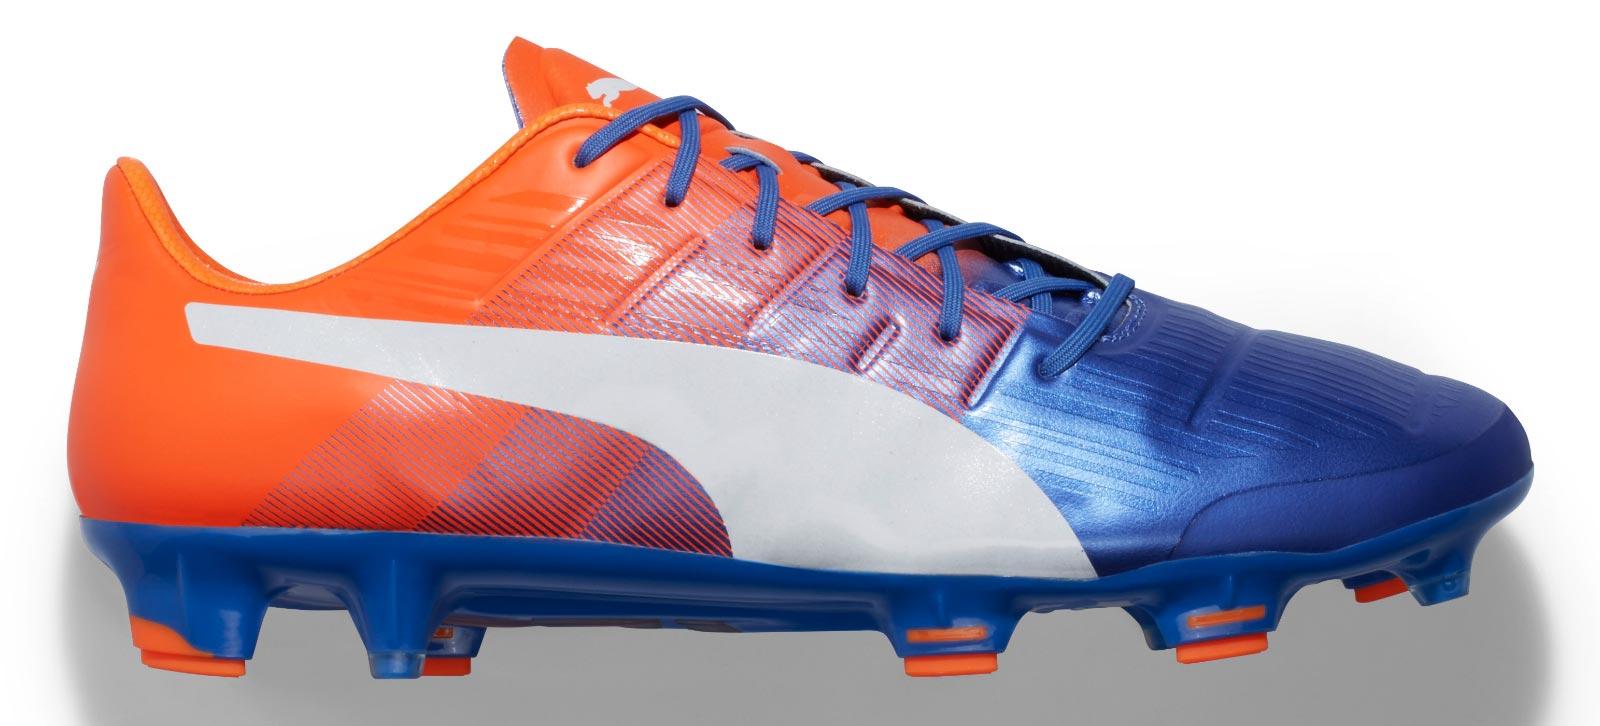 blue-orange-puma-evopower-2016-2017-boots-outer